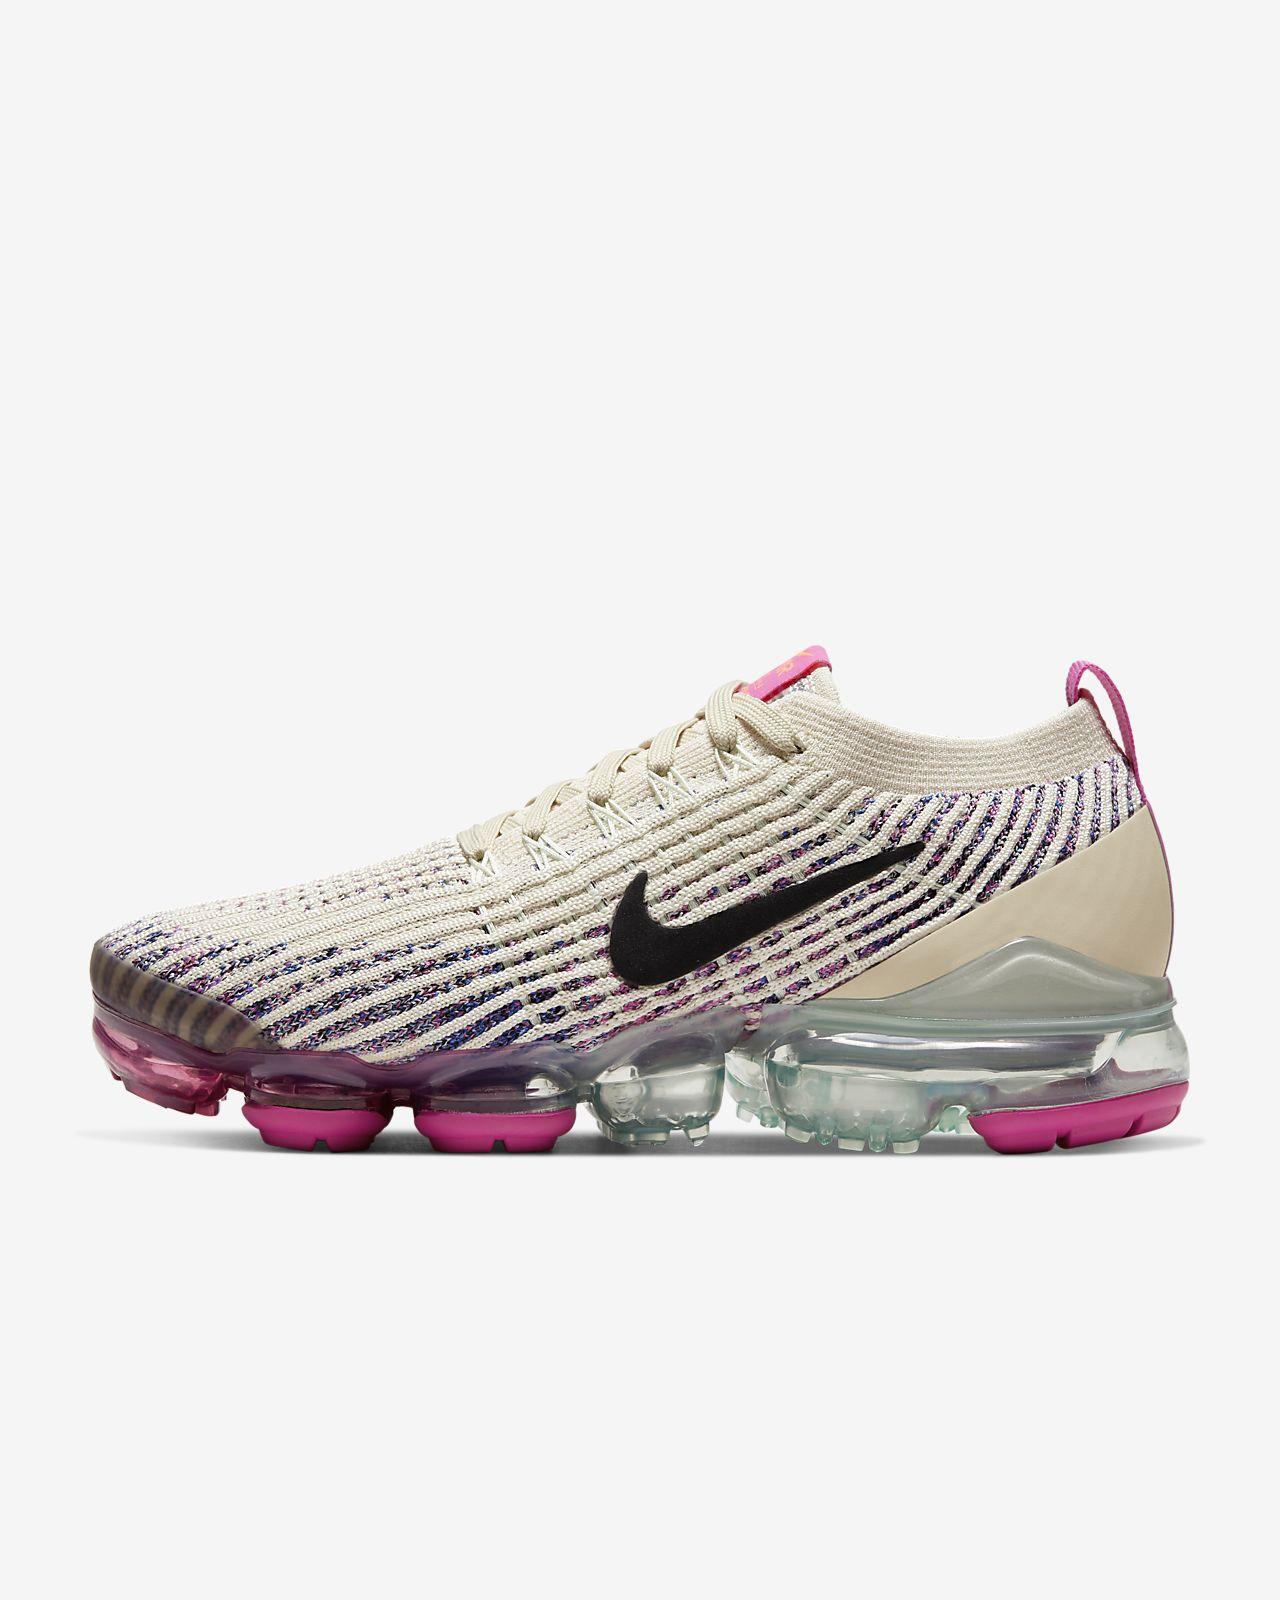 nike sneakers hvide, Nike Performance Metcon Flyknit 3